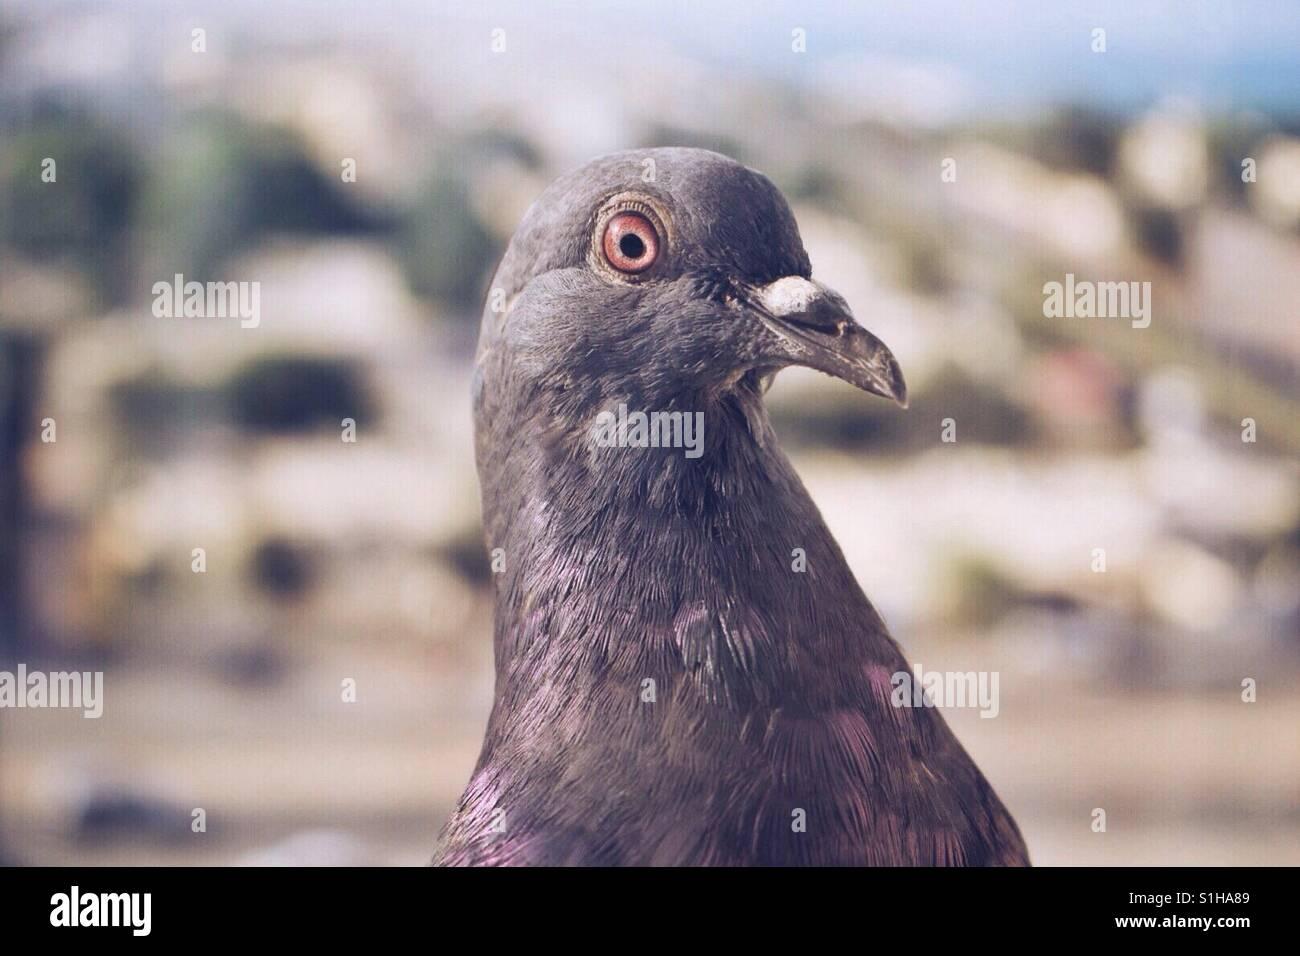 Pigeon - Stock Image